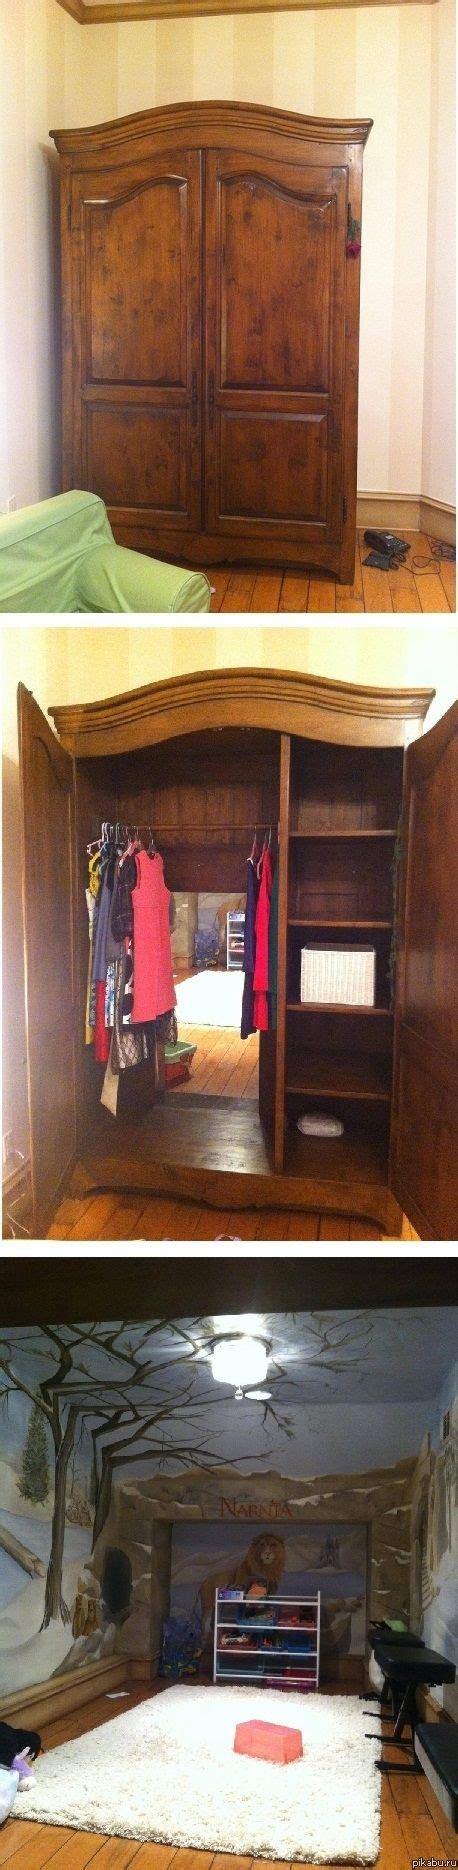 real narnia wardrobe   home hidden rooms